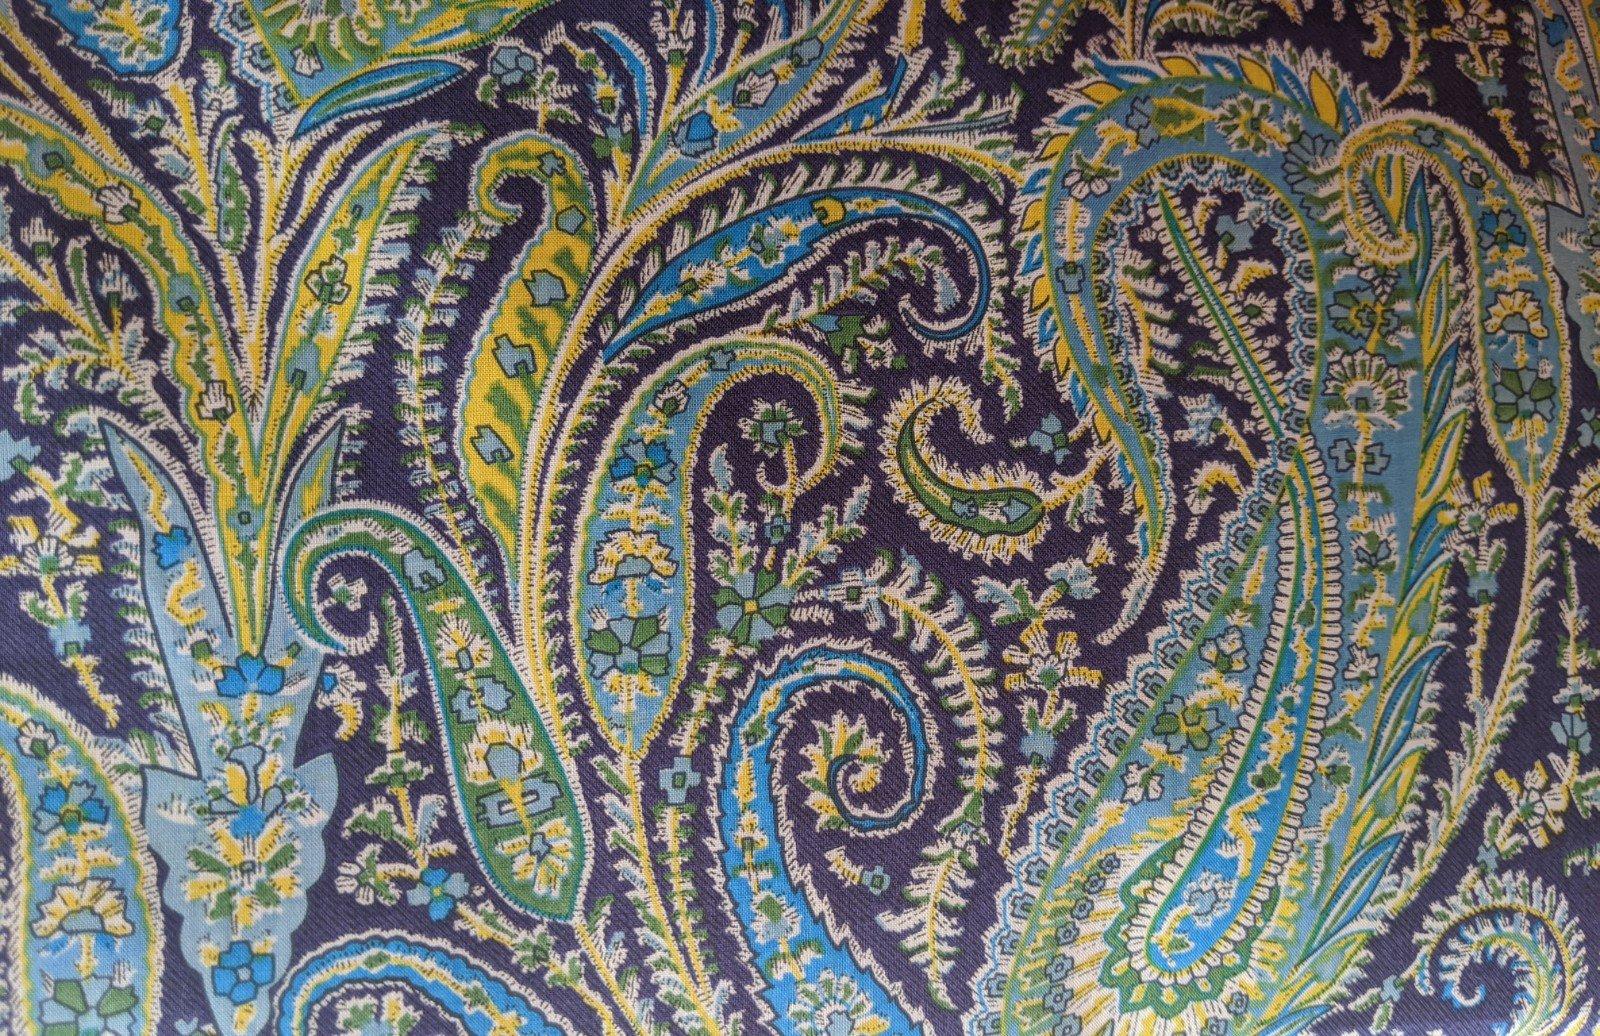 Liberty of London Cotton Lawn - Paisley Cool